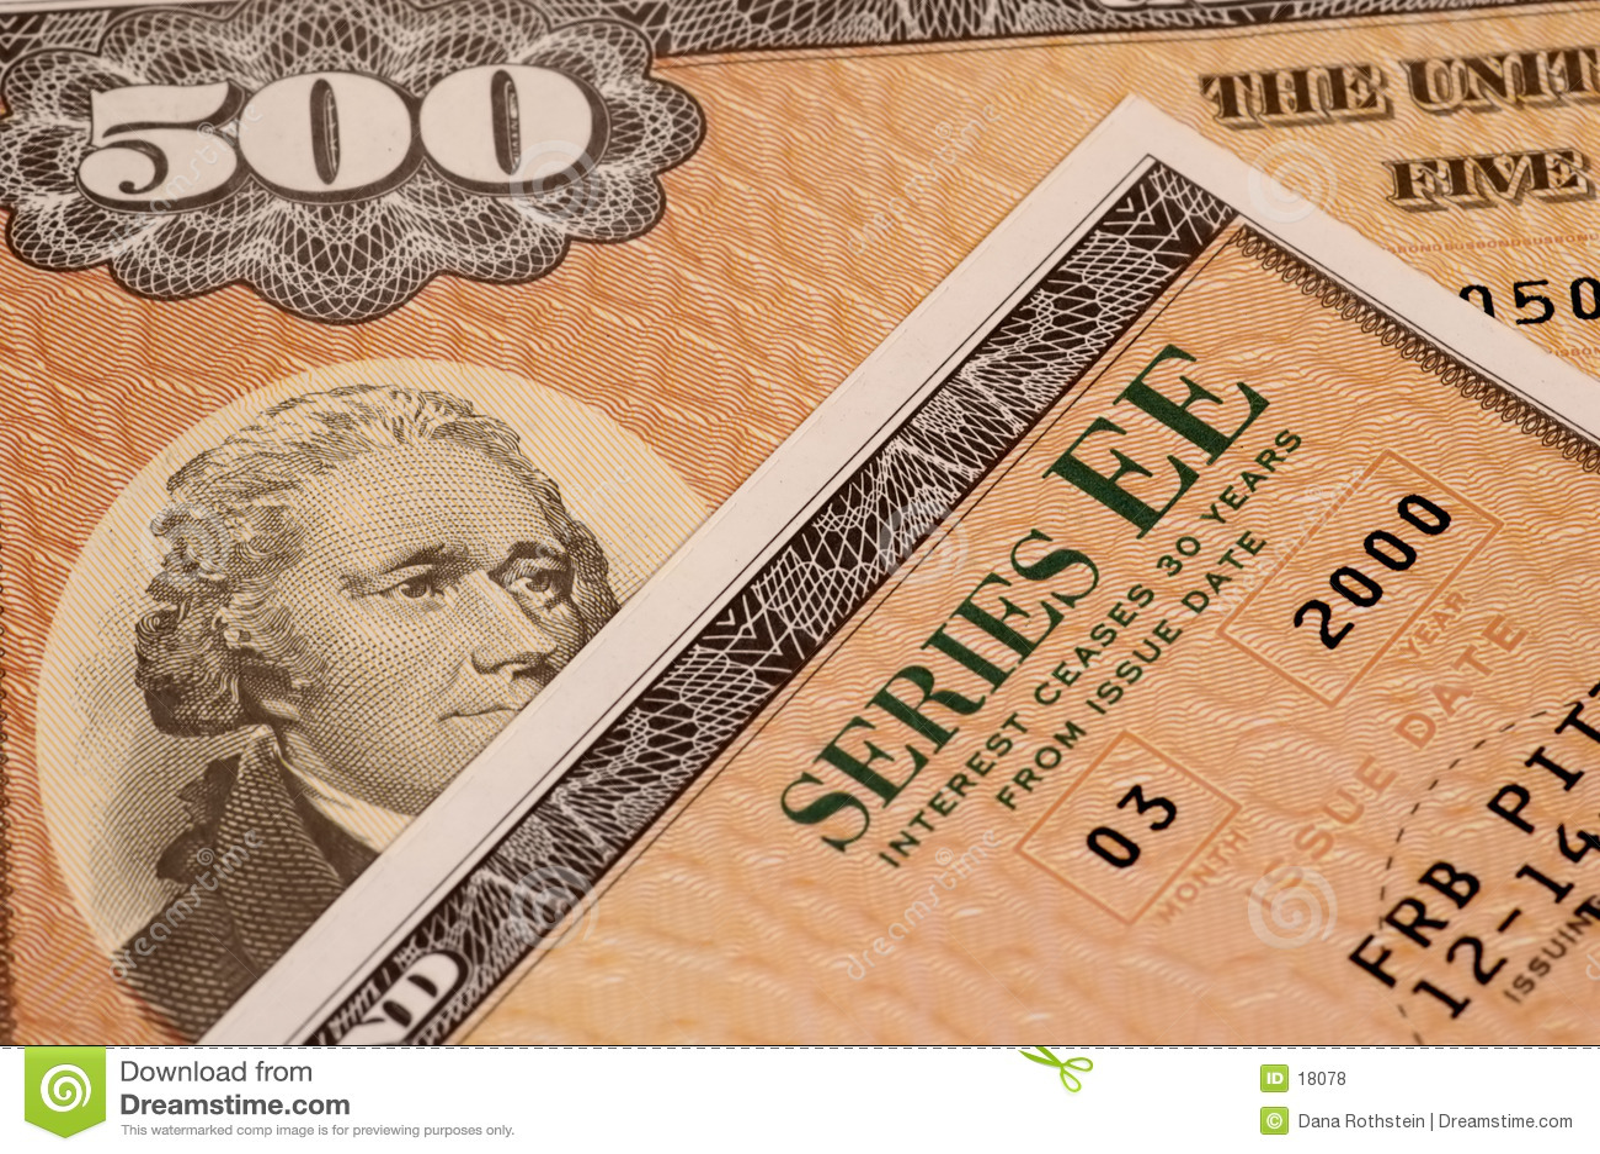 Series EE Saving Bonds